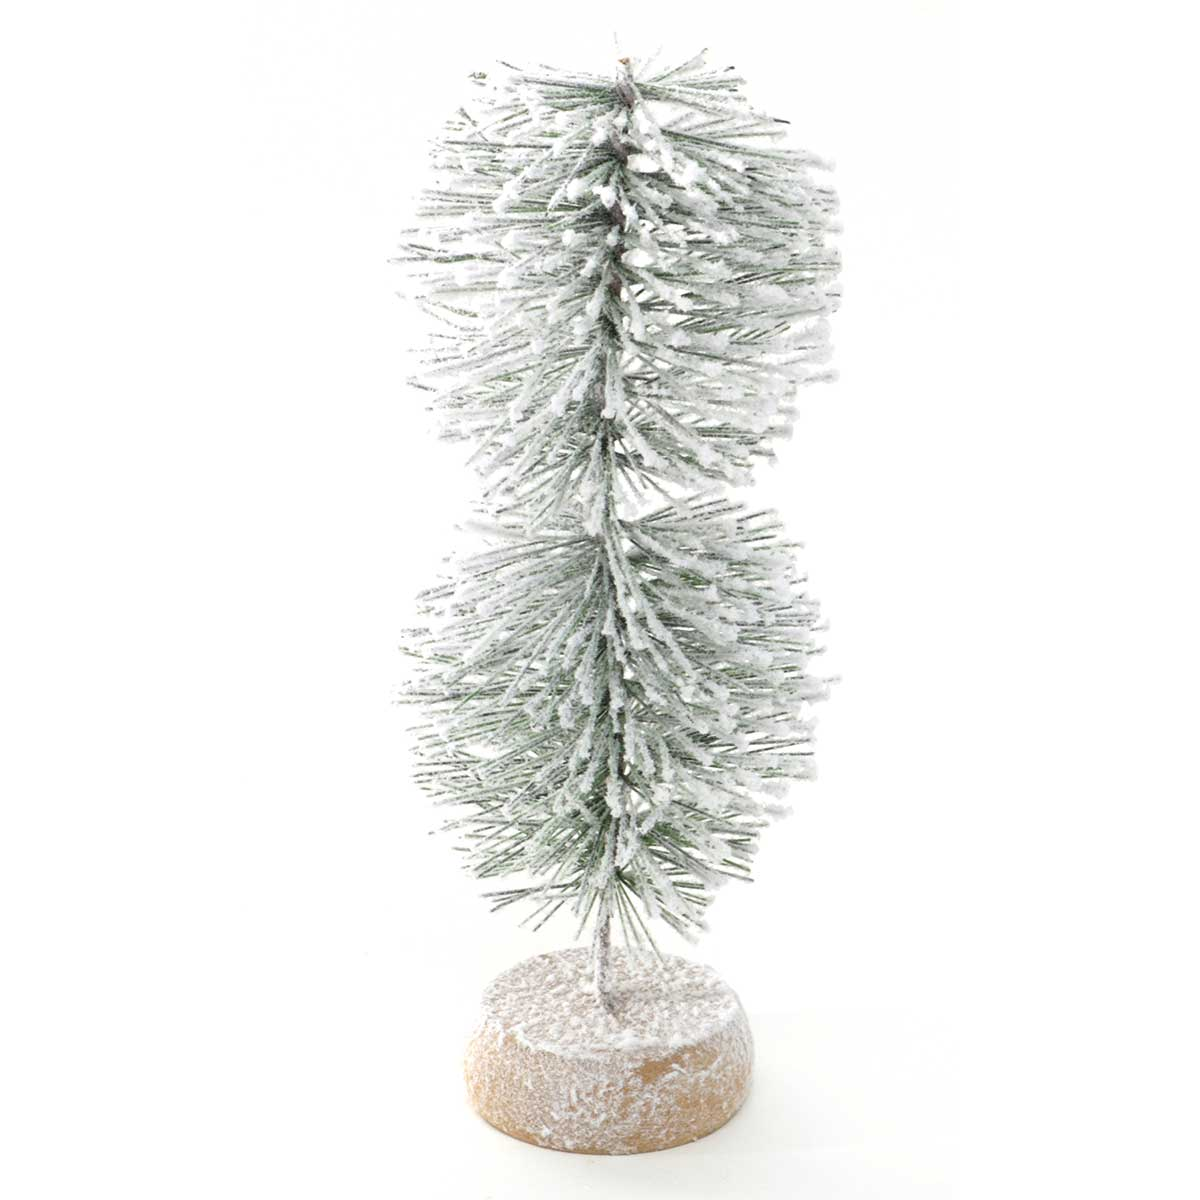 "MINI TOPIARY TREE WITH SNOW 3""X8.75"""